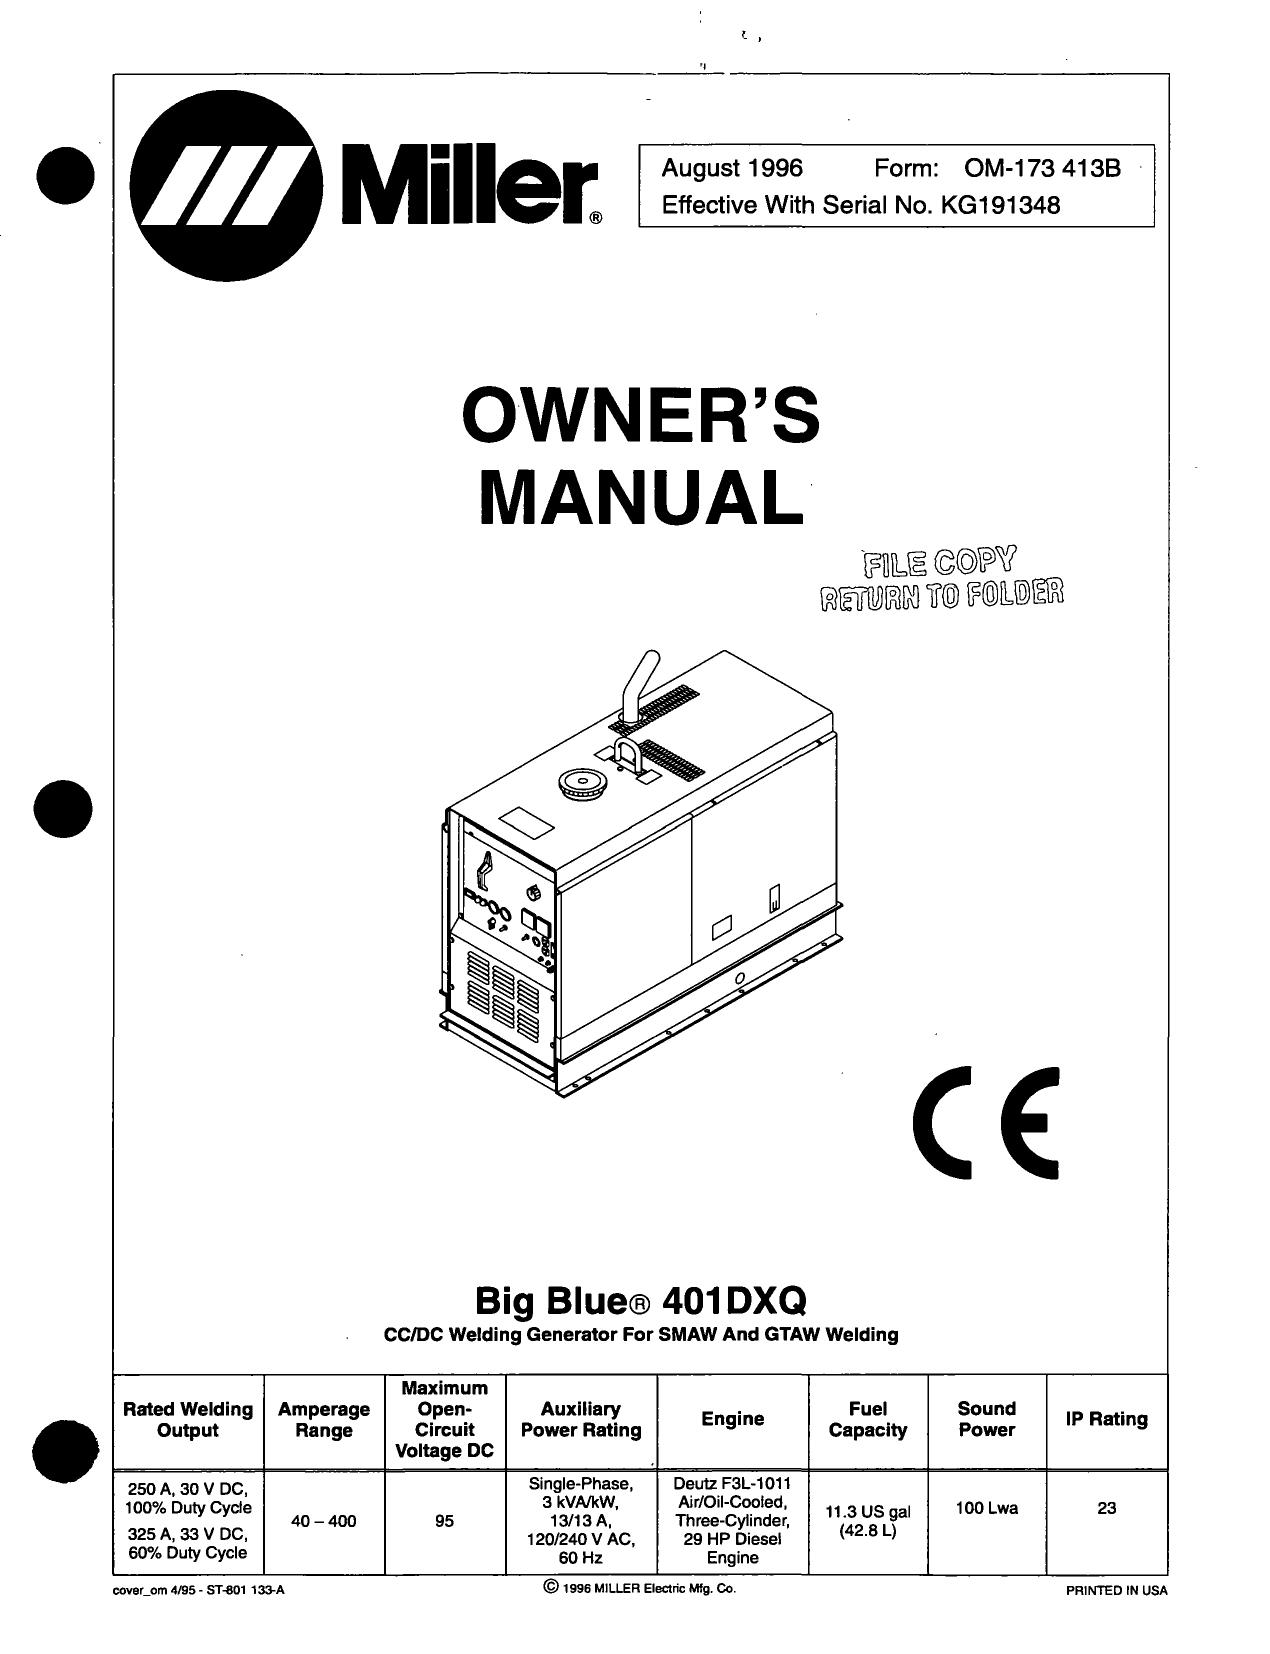 MILLER R-115  SERVICE TECHNICAL MANUAL